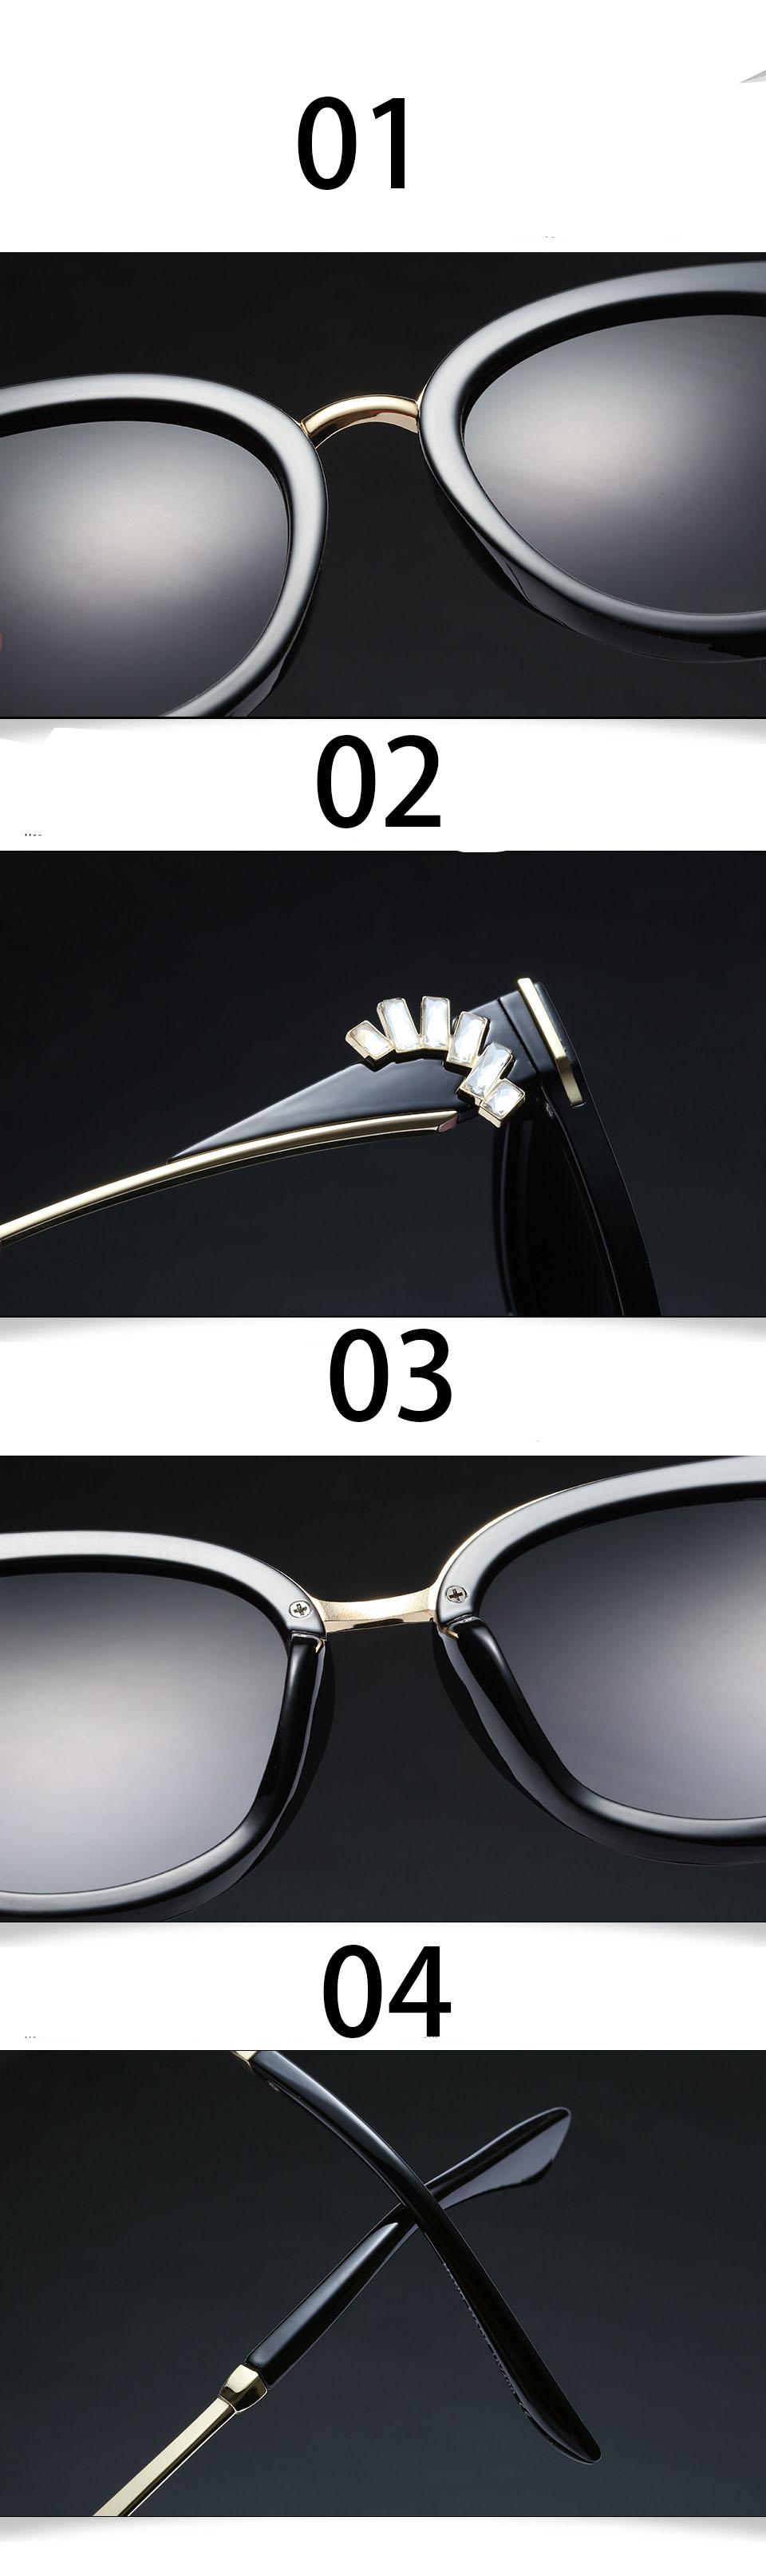 HTB1jzEdXPihSKJjy0Ffq6zGzFXan - Oversized Crystal Acetate Black Cat Eye Sunglasses 2018